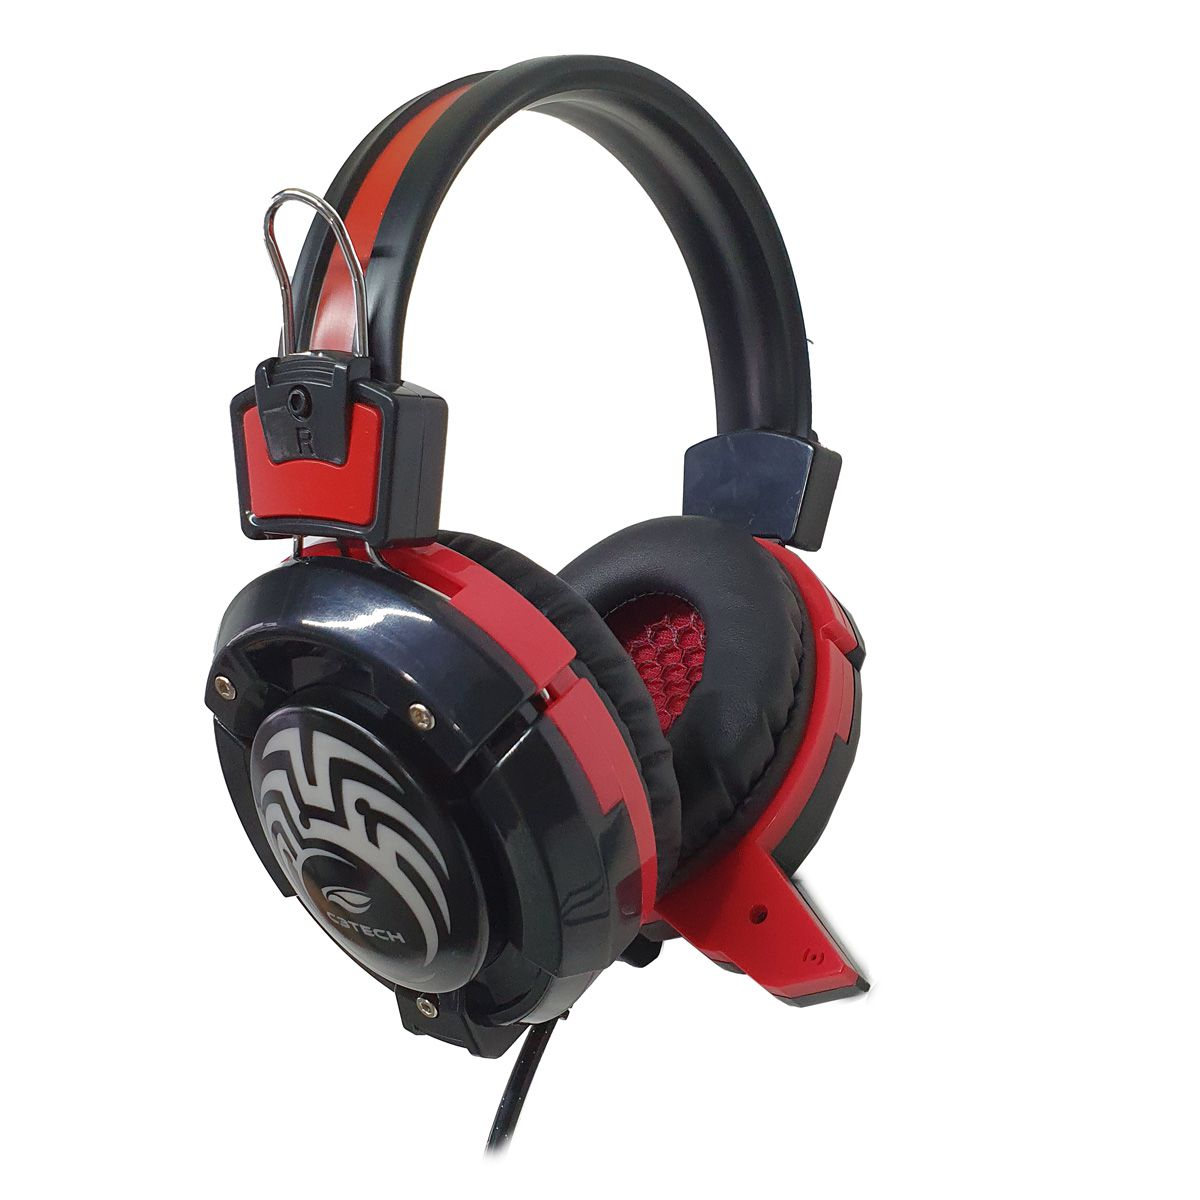 Fone HeadSet PH-G10 RGB Flycatcher Gaming C3Tech